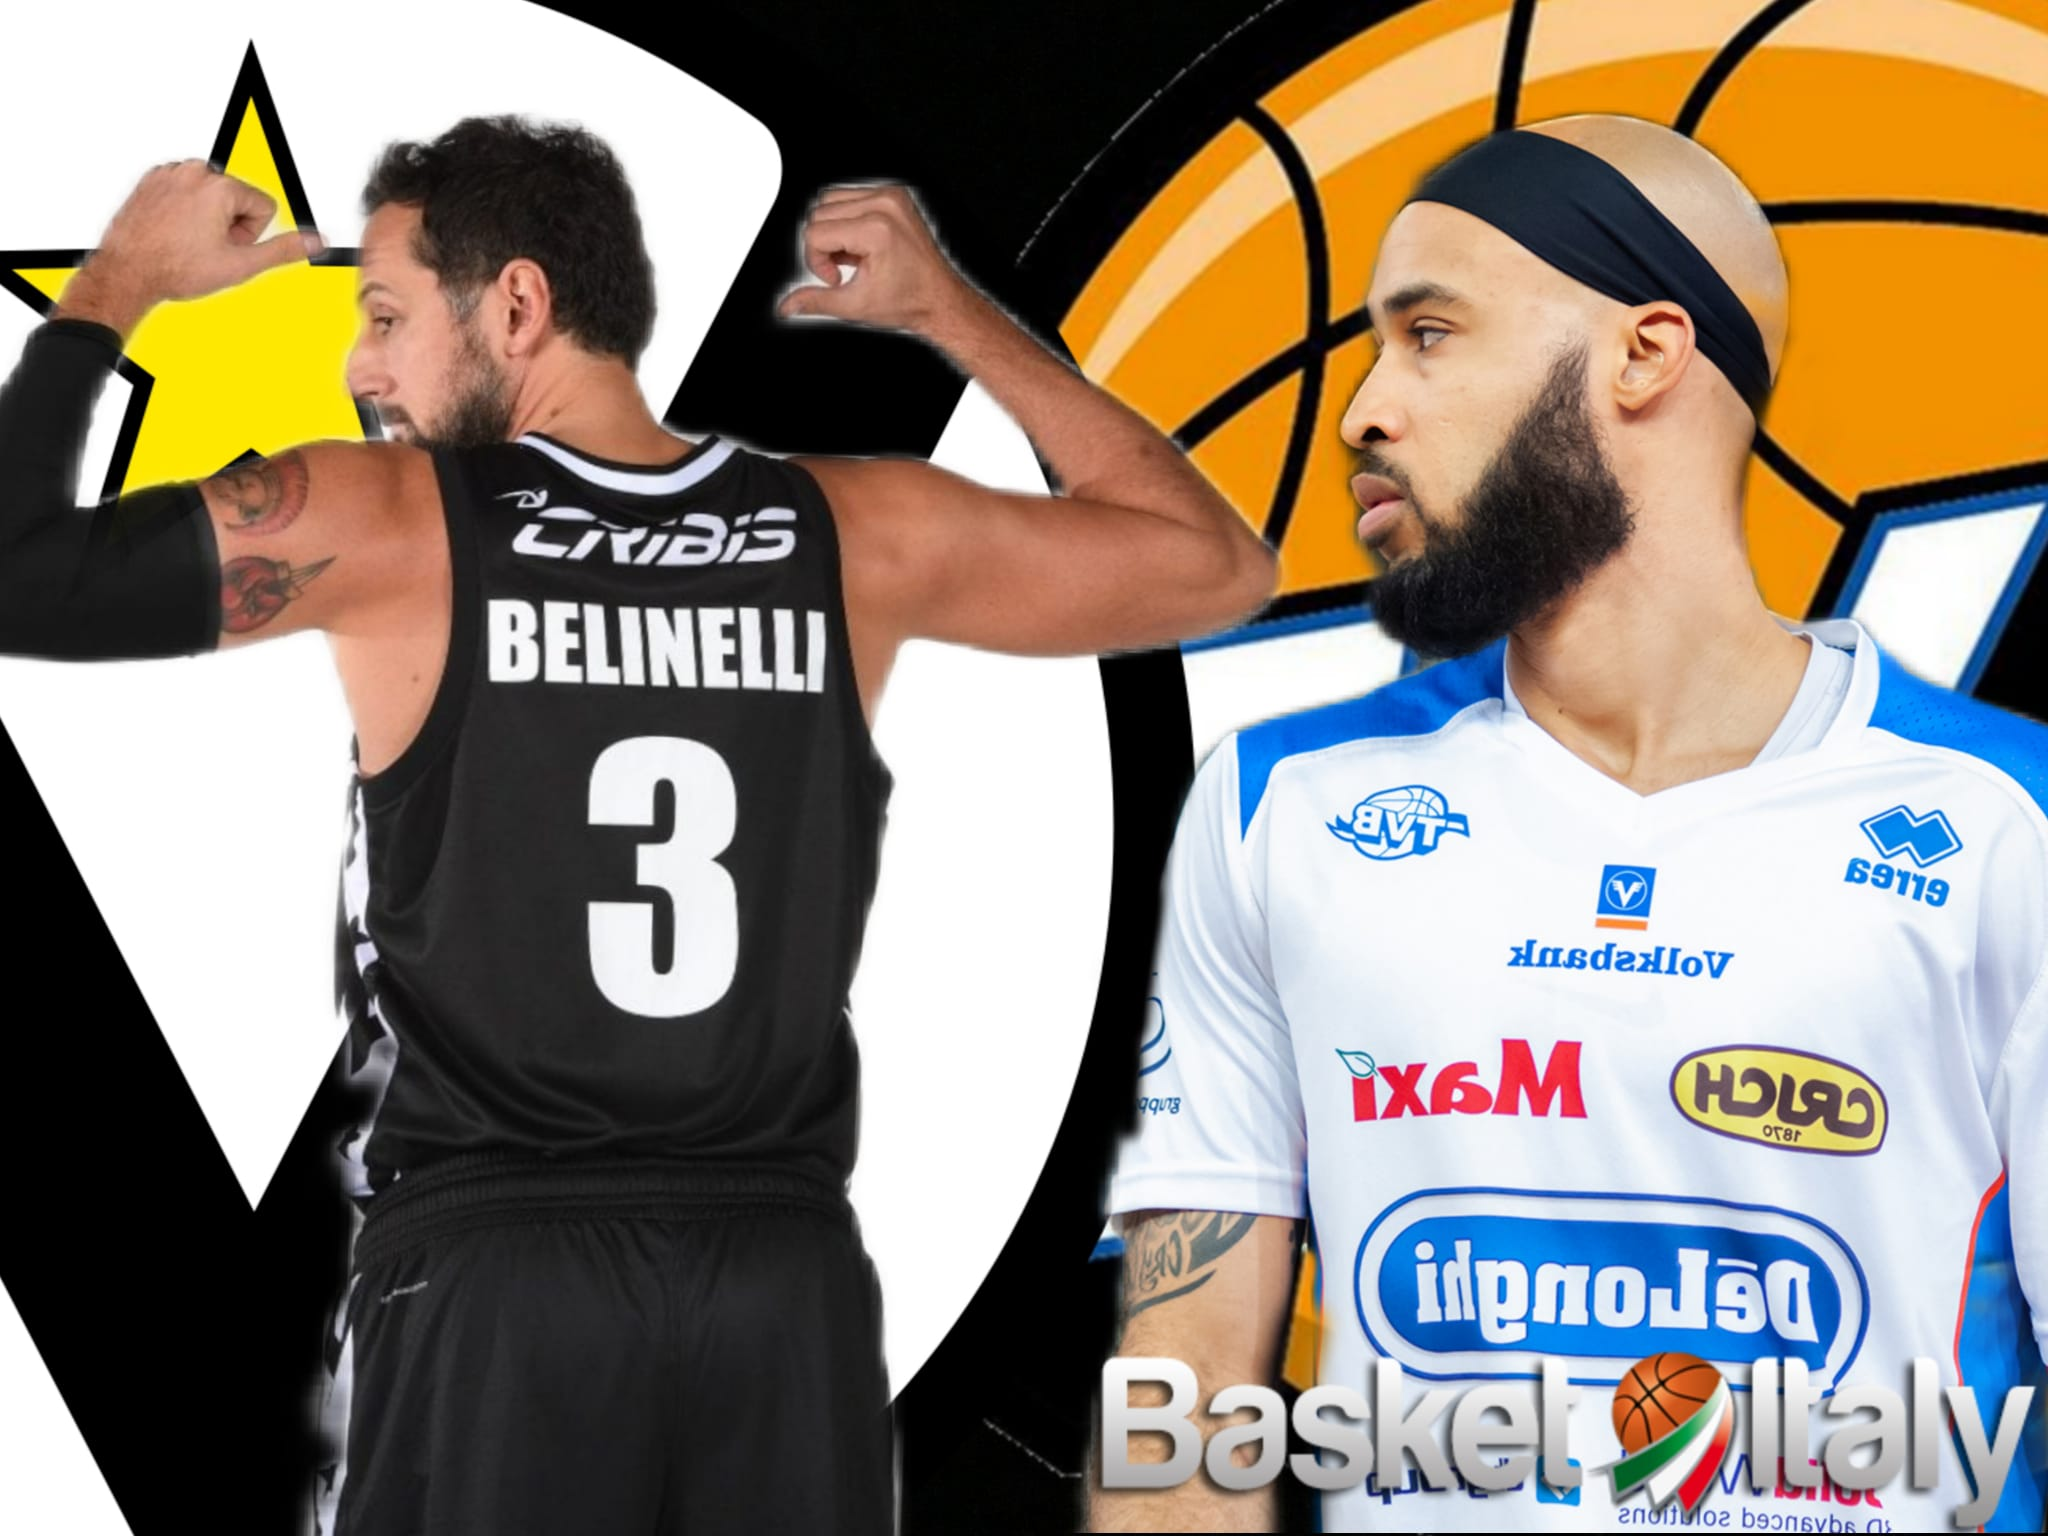 #Playoff2021; Virtus Bologna-De'Longhi Treviso: Vnere condannate a vincere